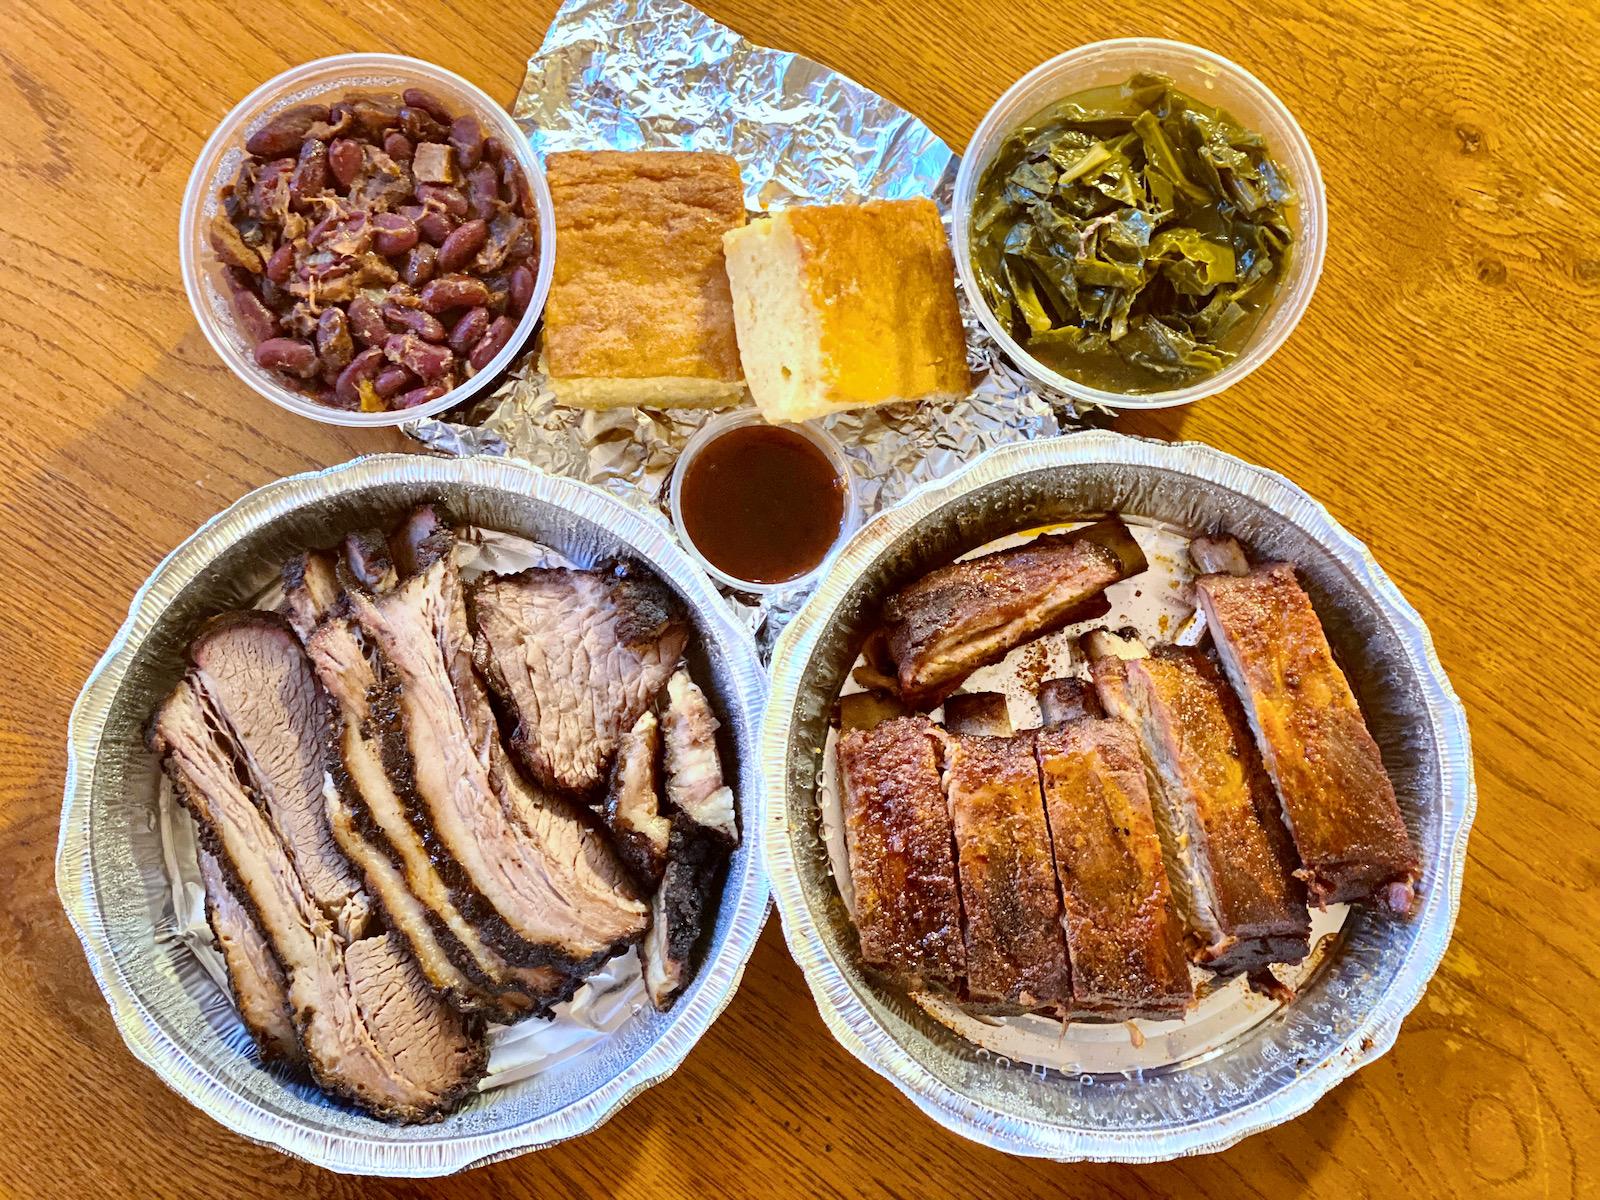 Heaven's Table BBQ